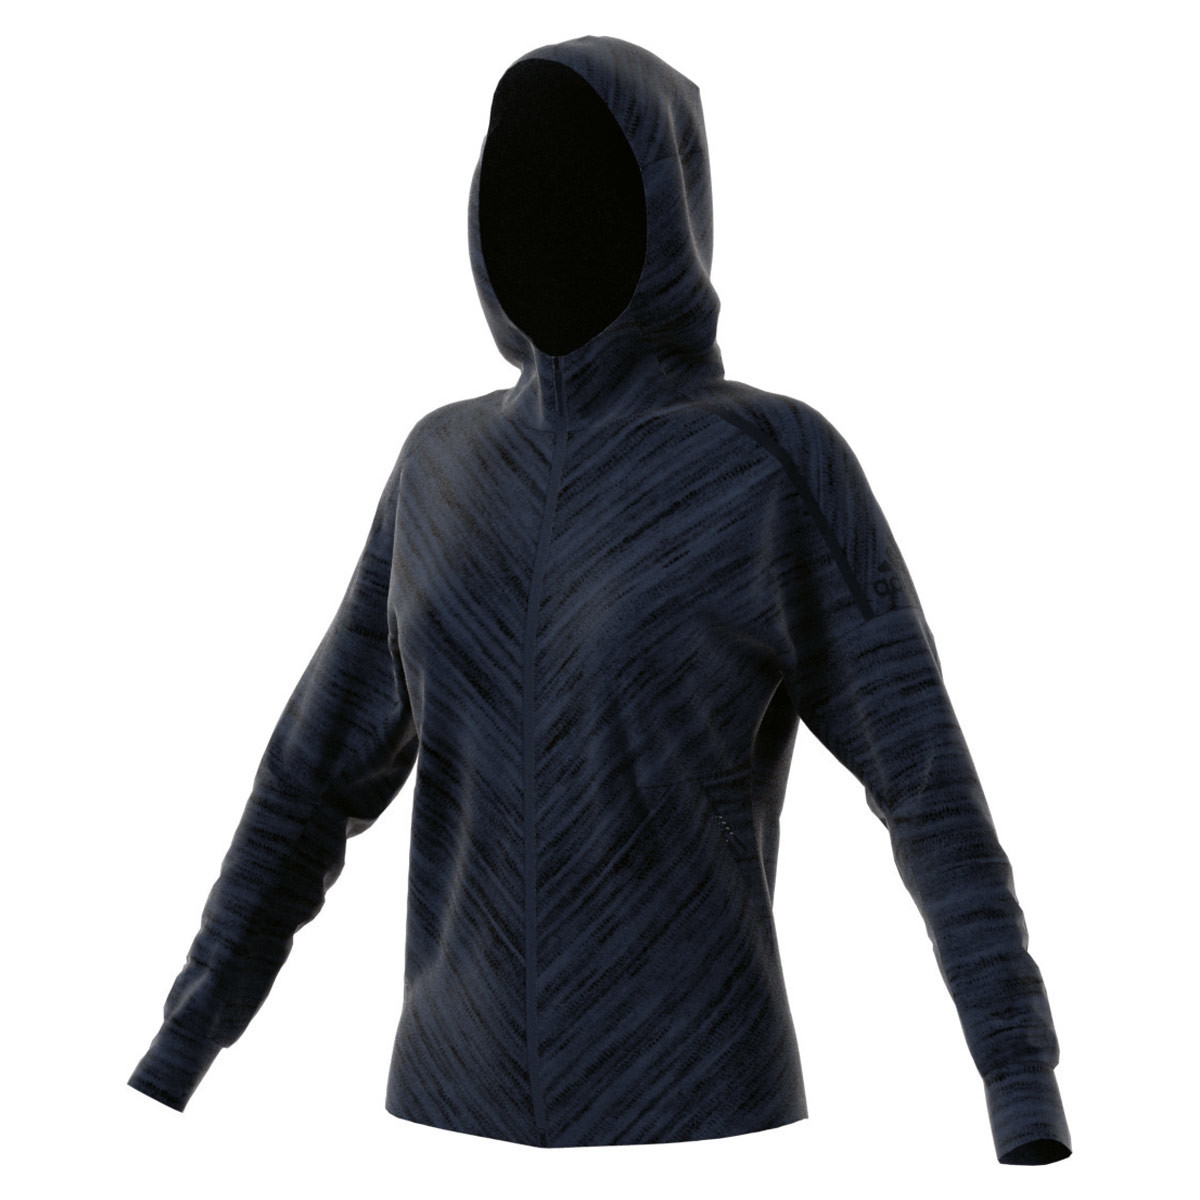 adidas ZNE Roadtr Hood - Sweatshirts   Hoodies for Women - Blue  845193209e